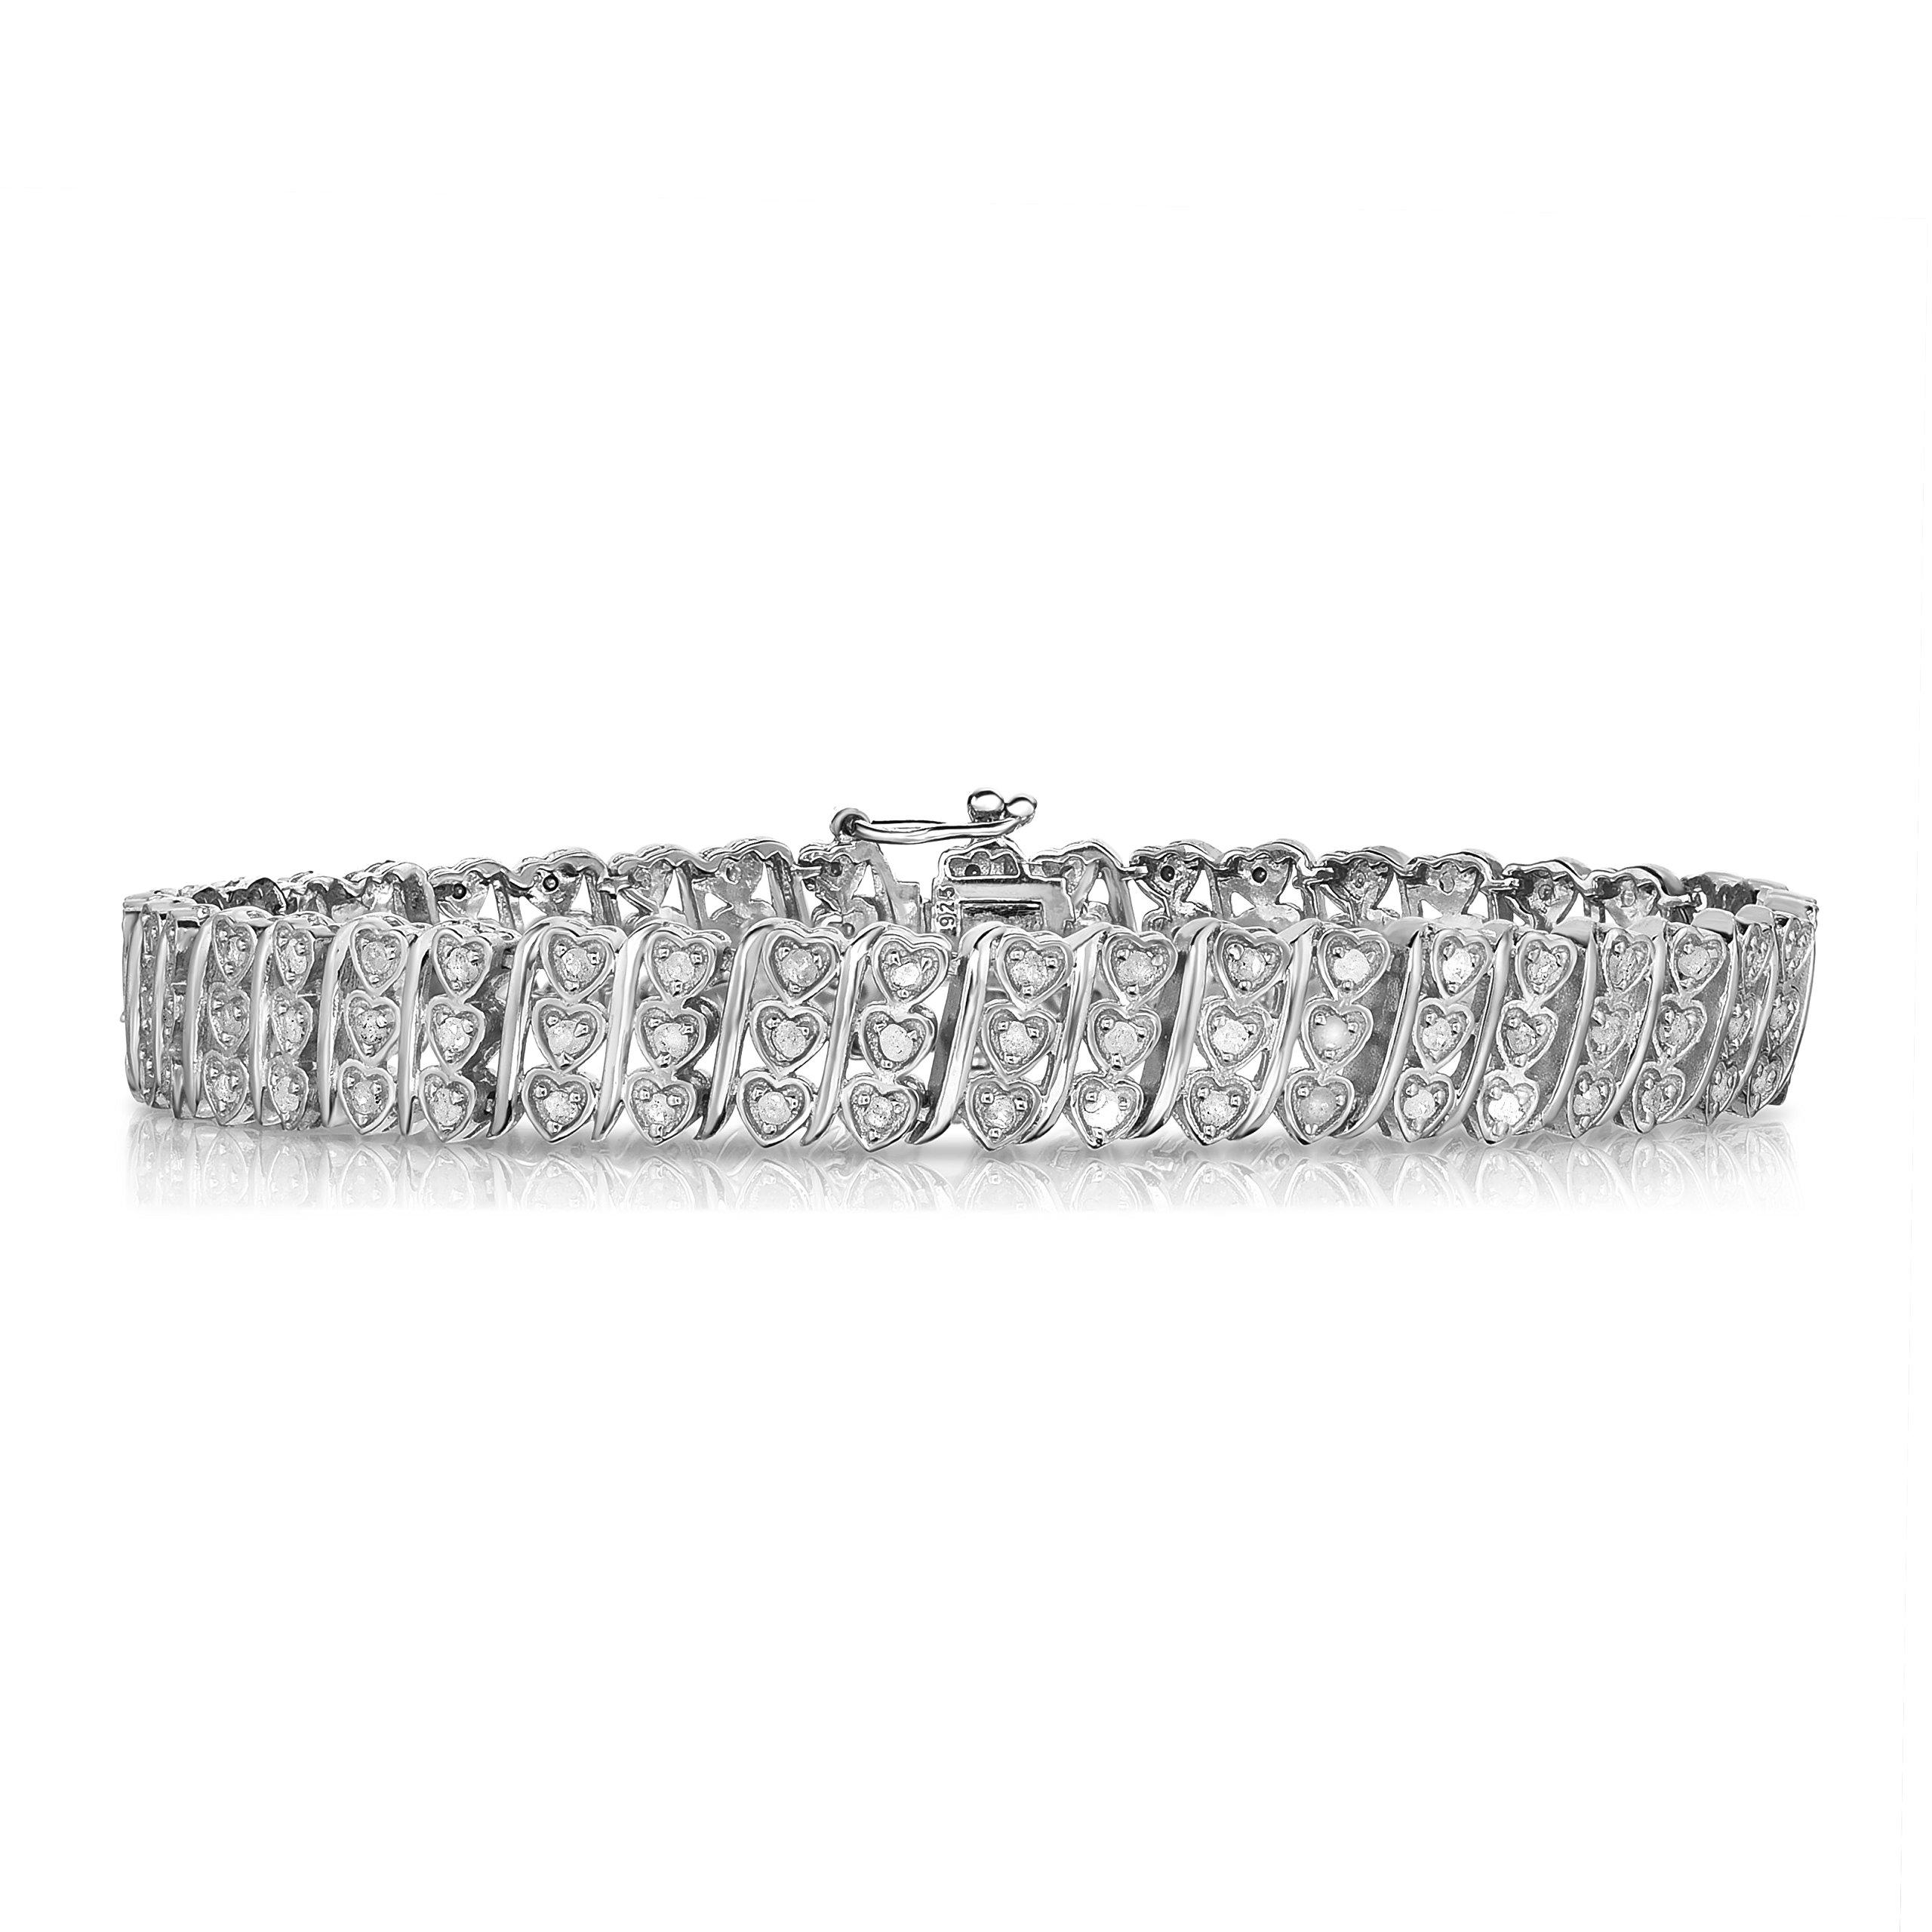 NATALIA DRAKE Blowout Sale Three Times The Love 1 CTW Diamond Triple Row Heart 7'' Bracelet in Sterling Silver